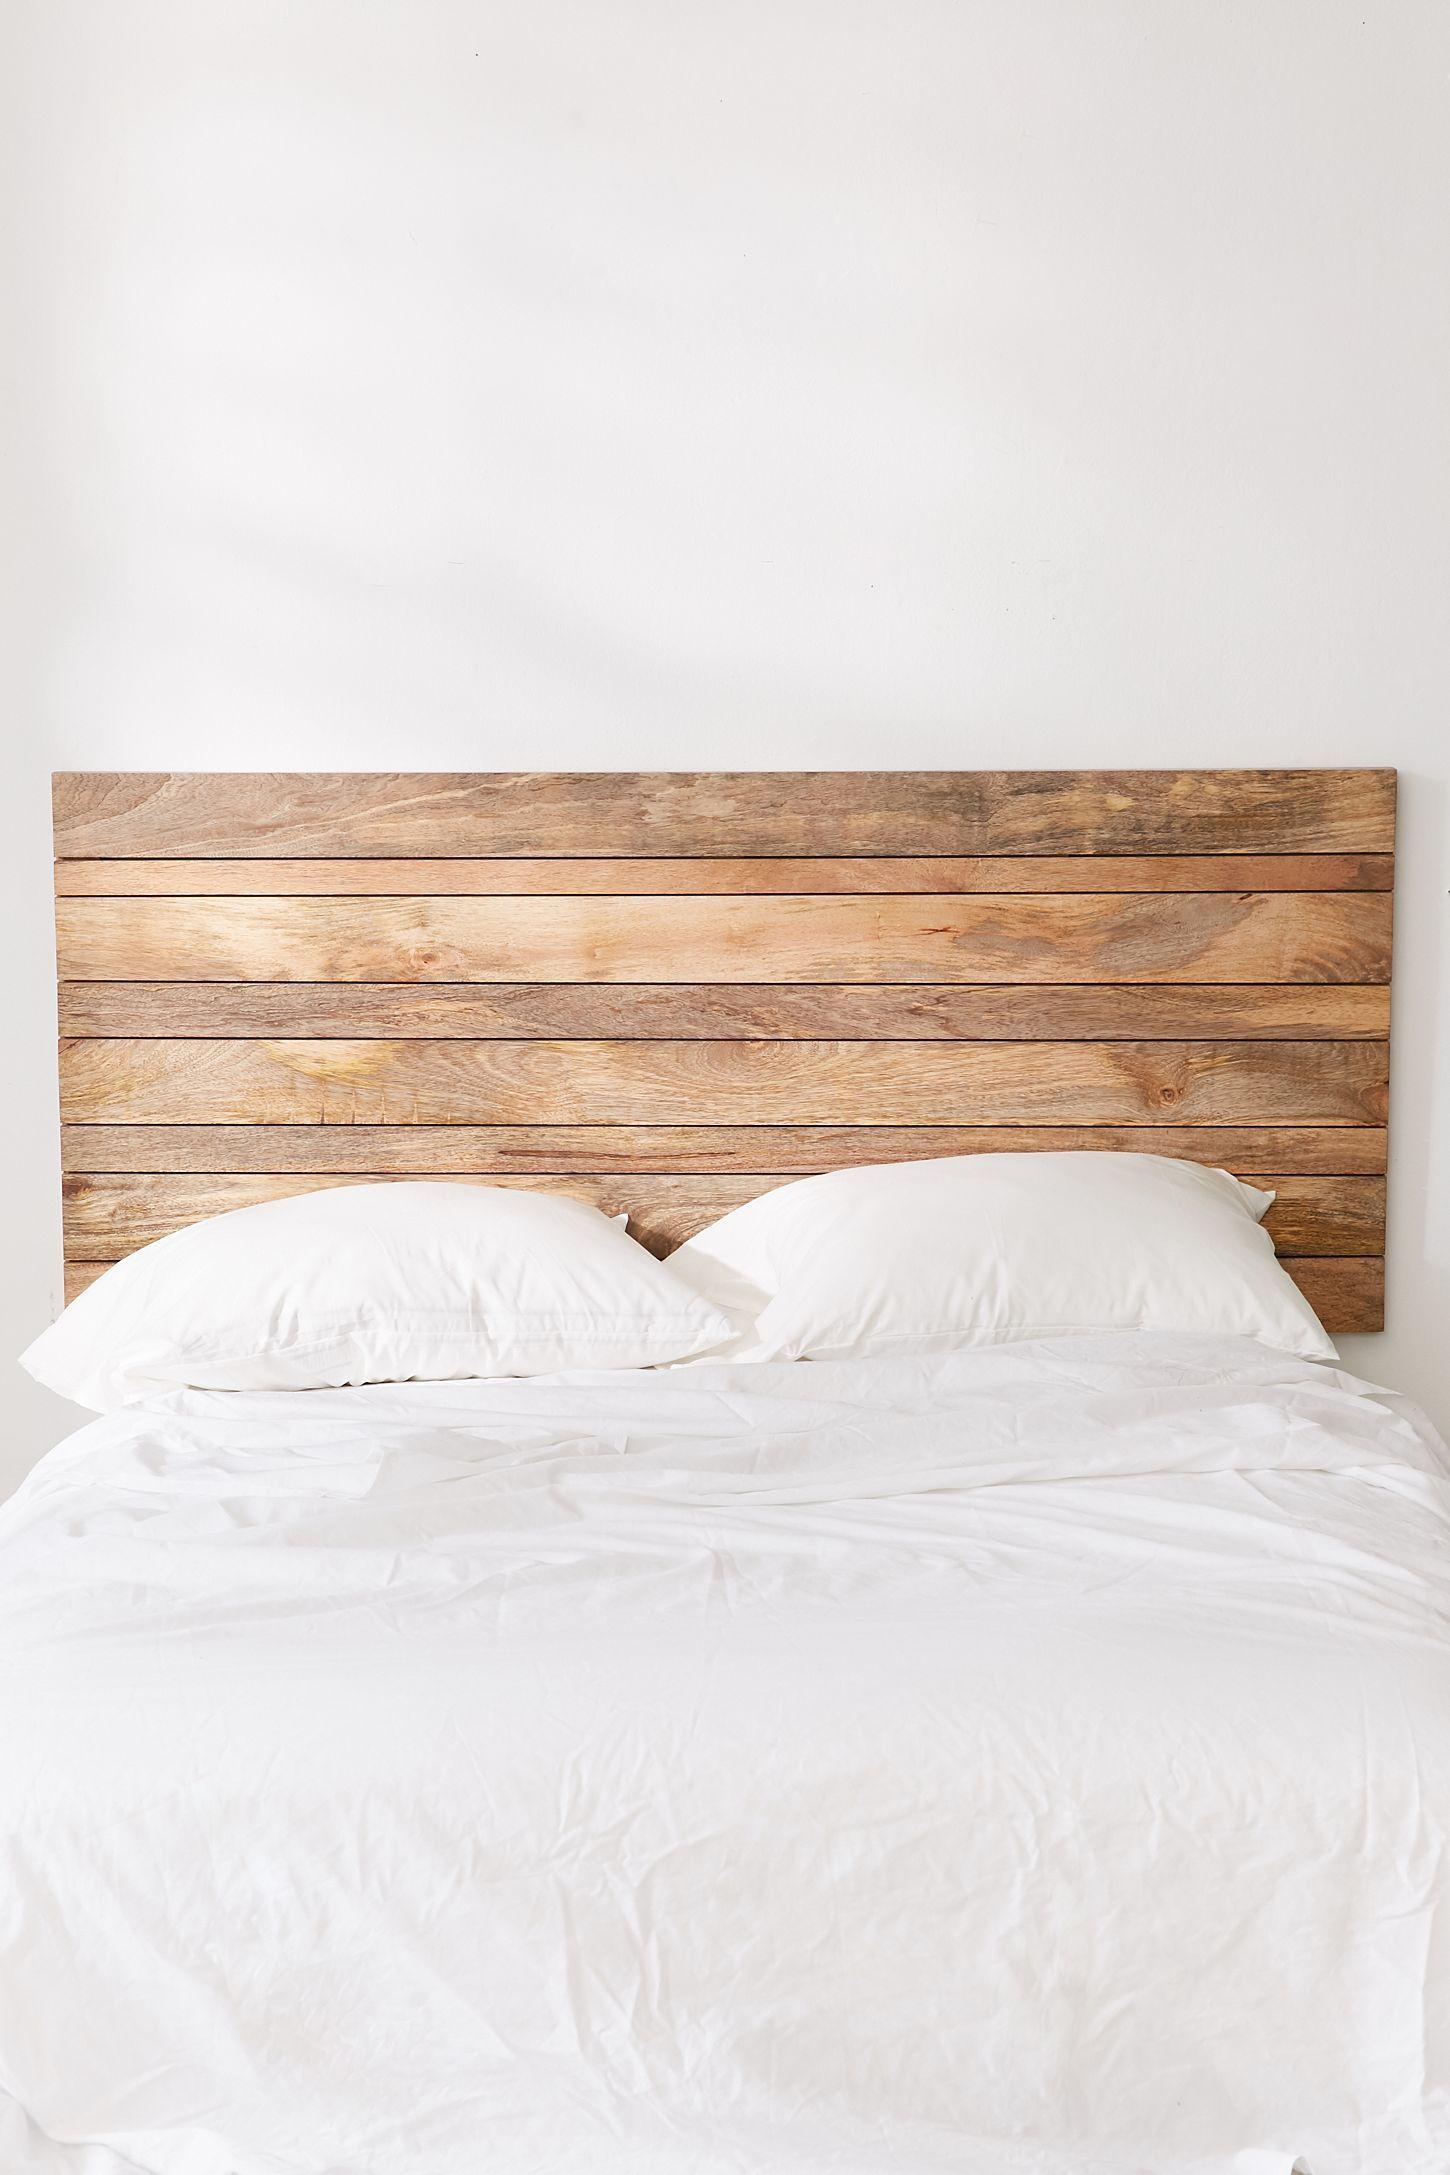 Slide View 3 Slatted Wooden Headboard Wood Headboard Bedroom